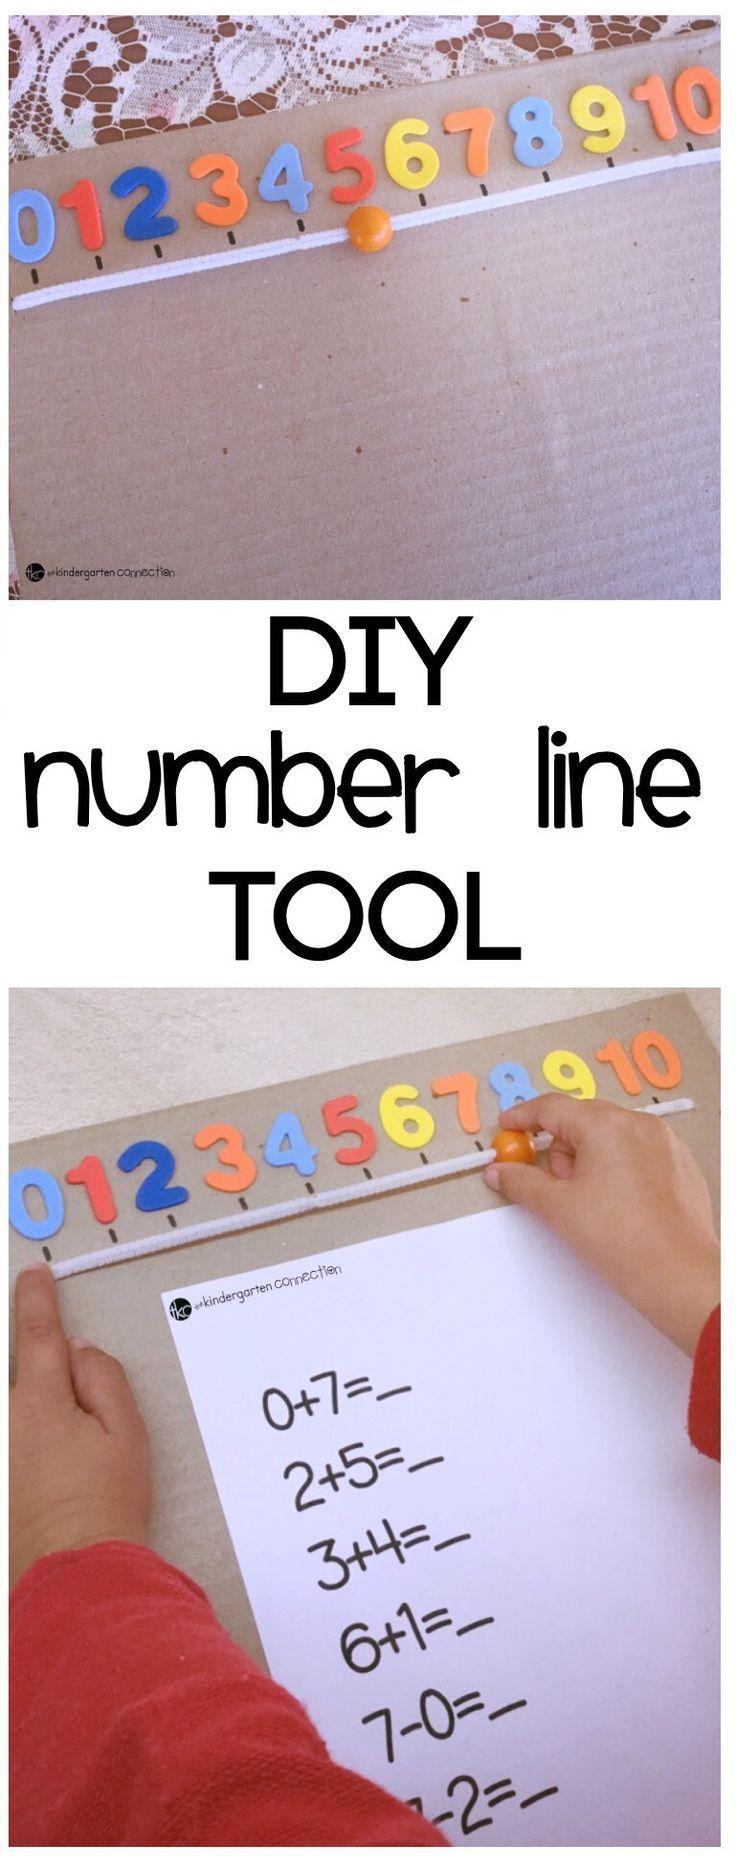 75 best Math images on Pinterest | Homeschool, Homeschooling and ...